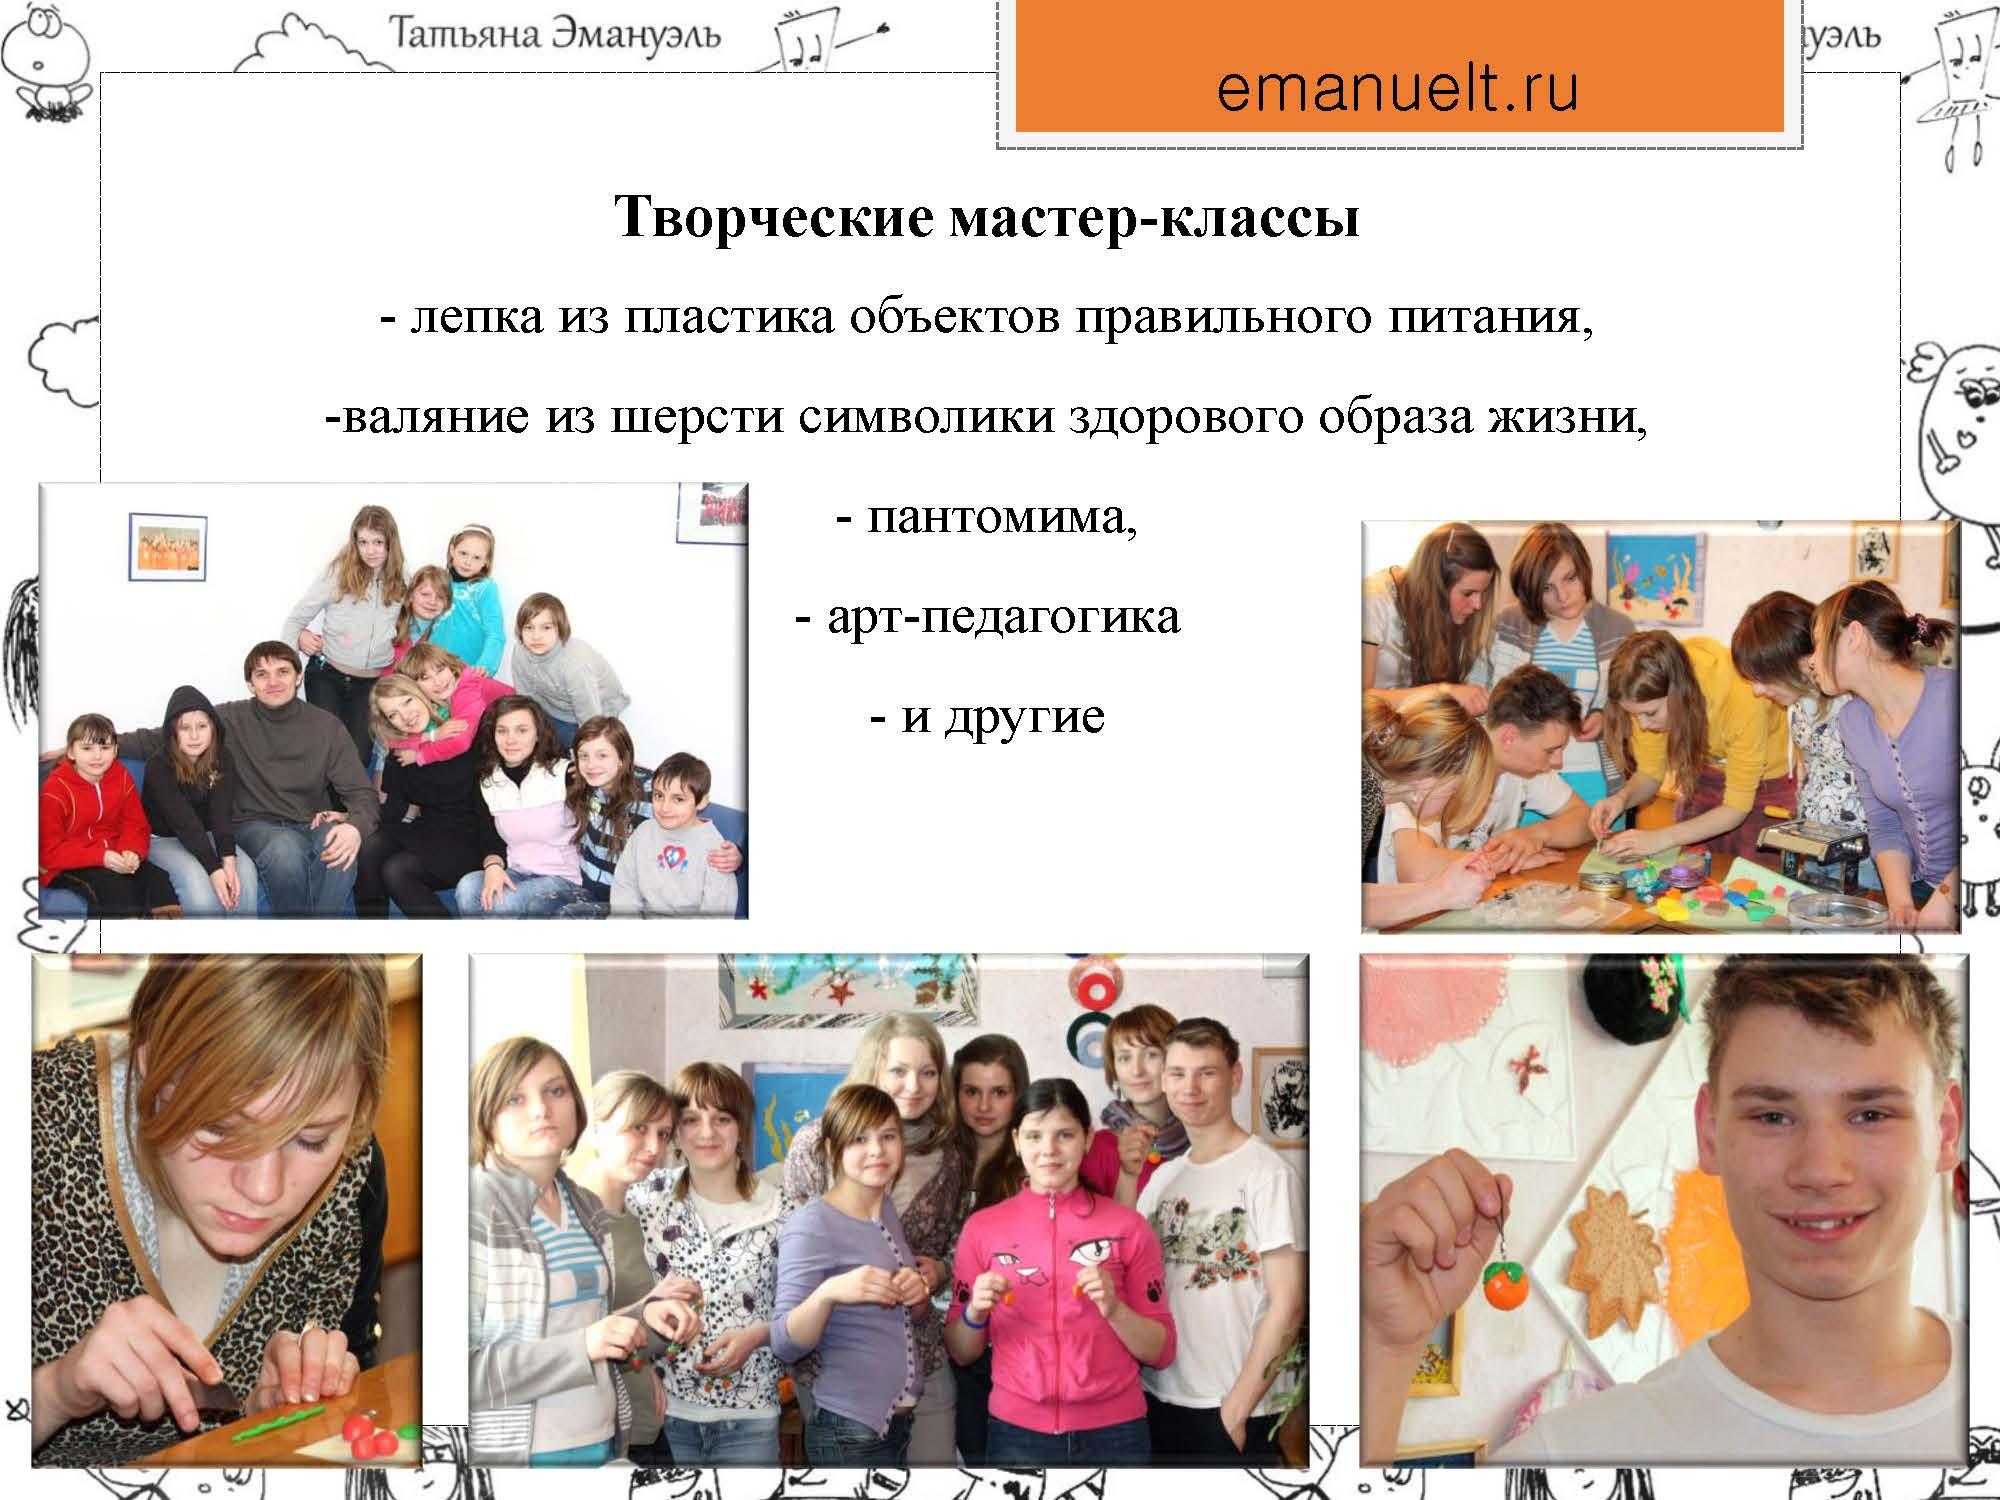 RazBeG_Emanuel_Страница_17